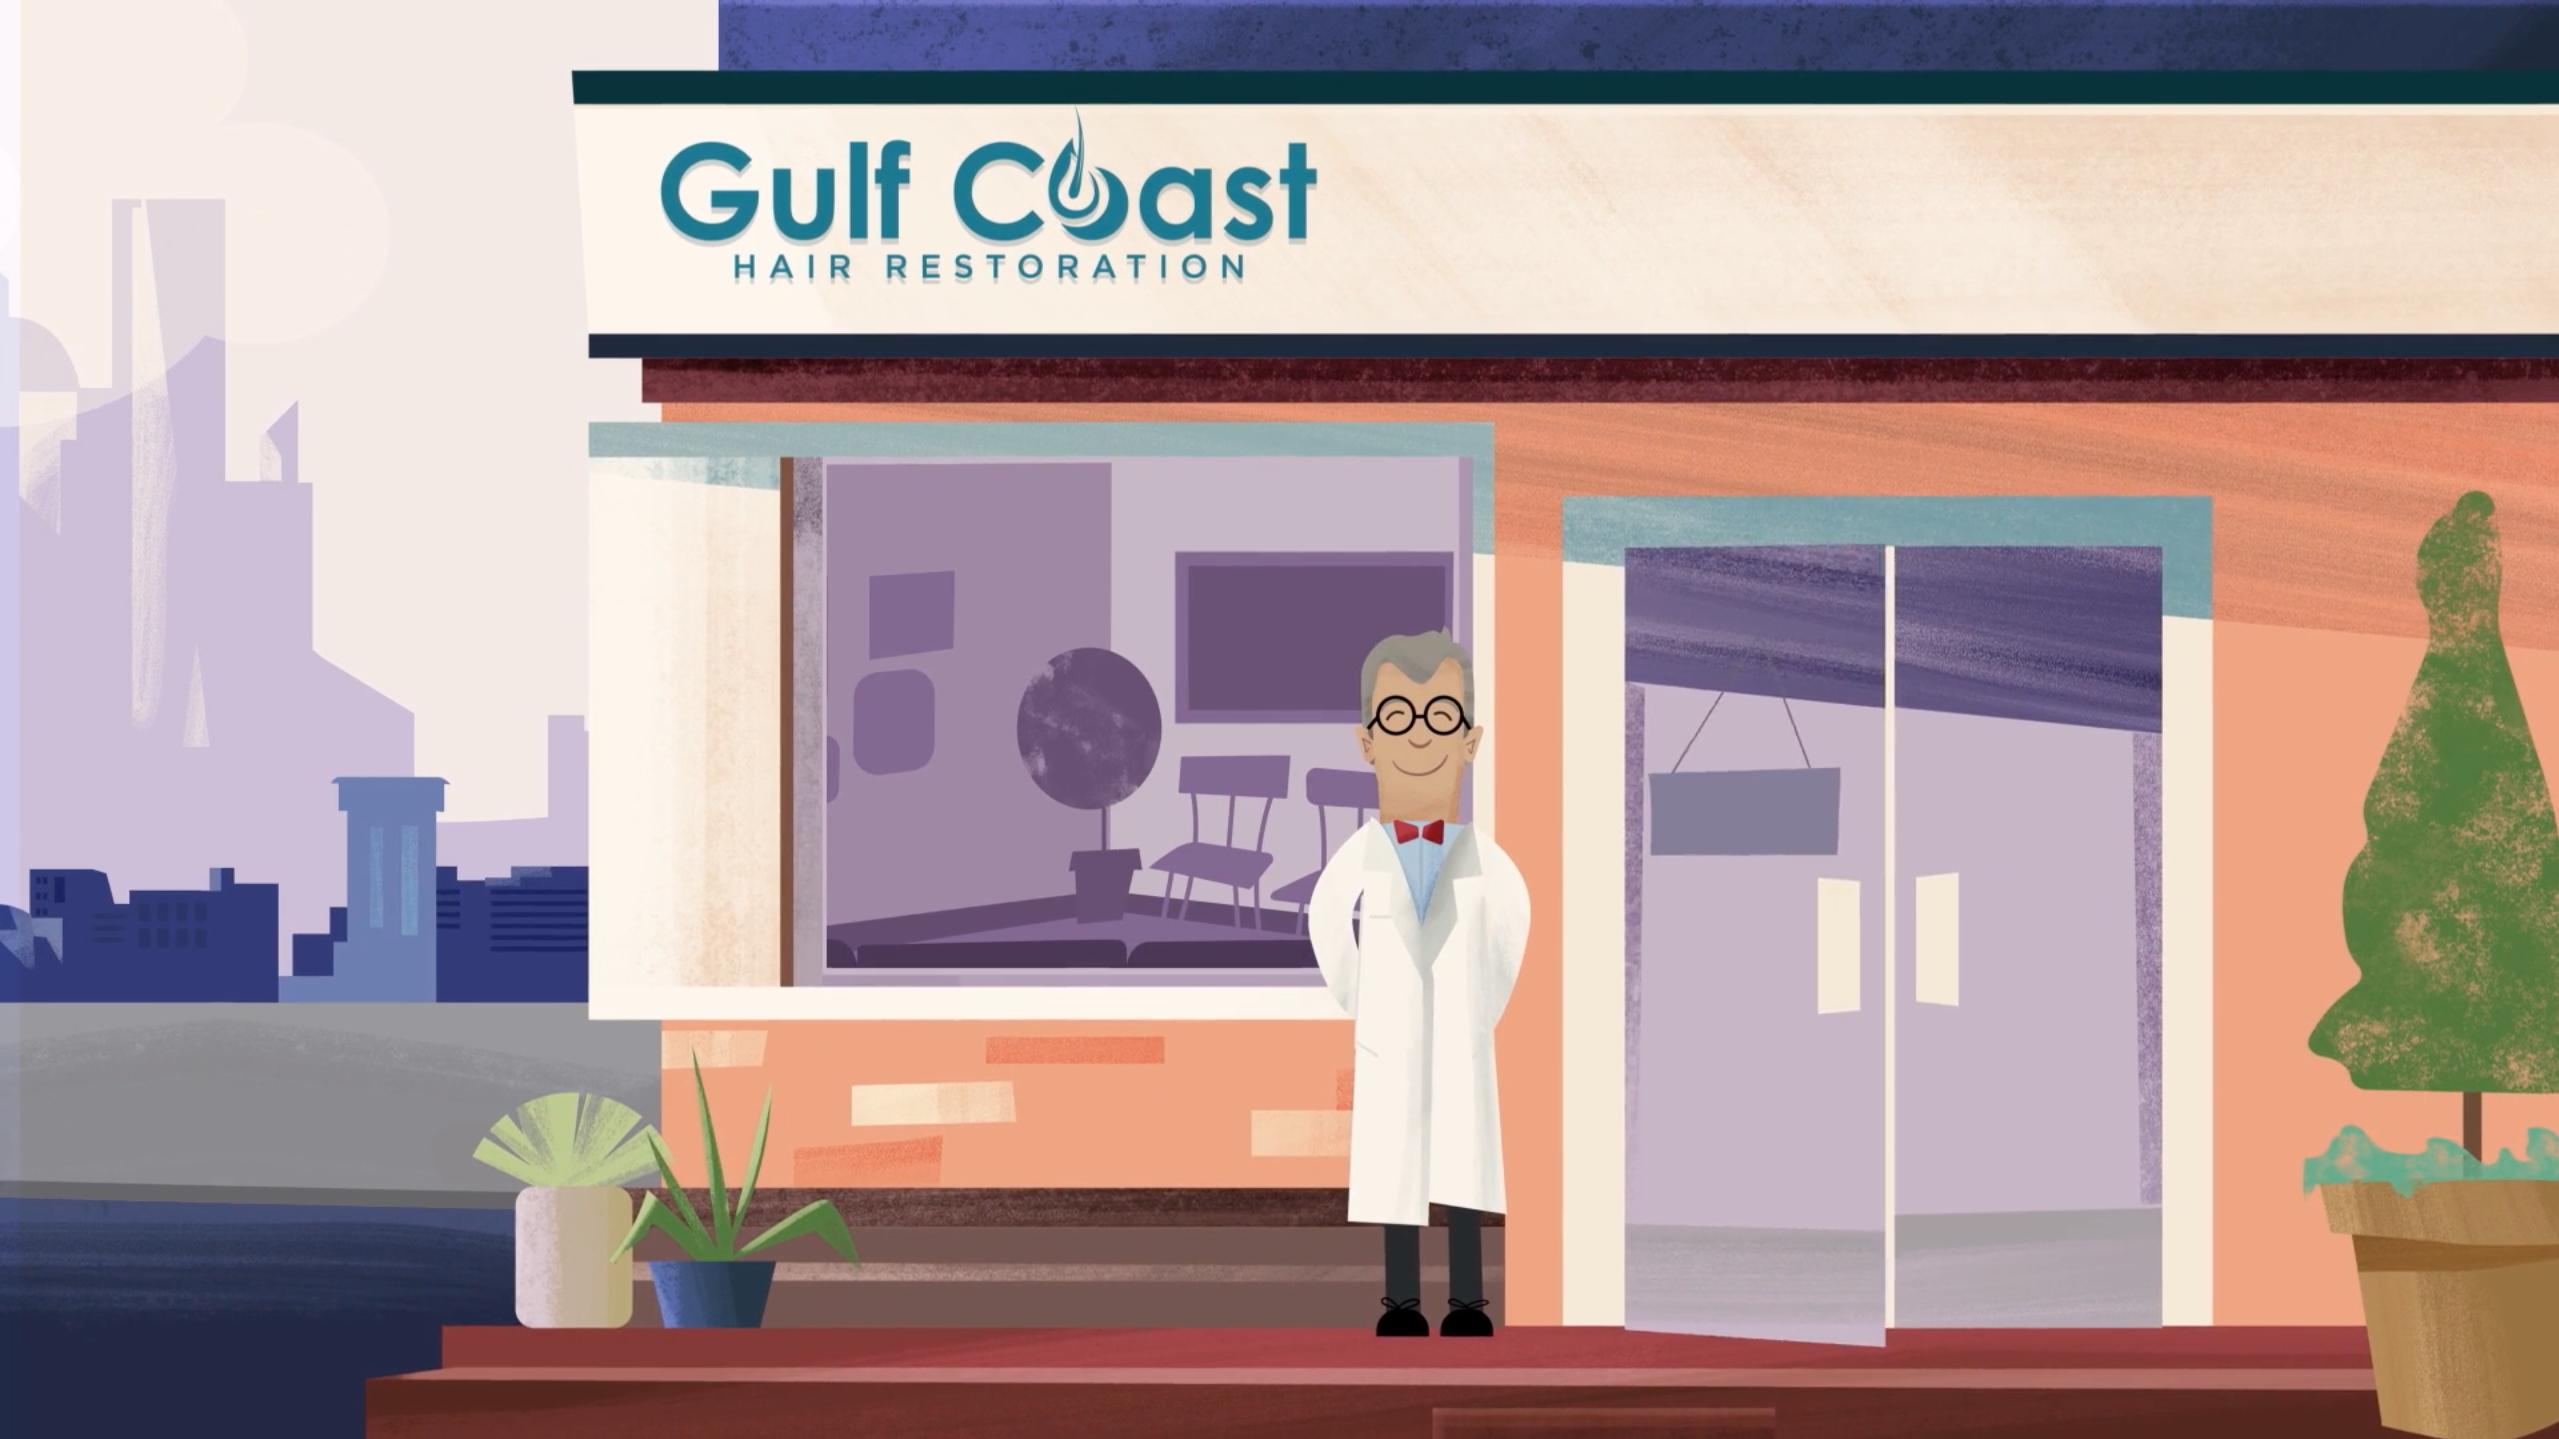 Gulf Coast Hair Restoration